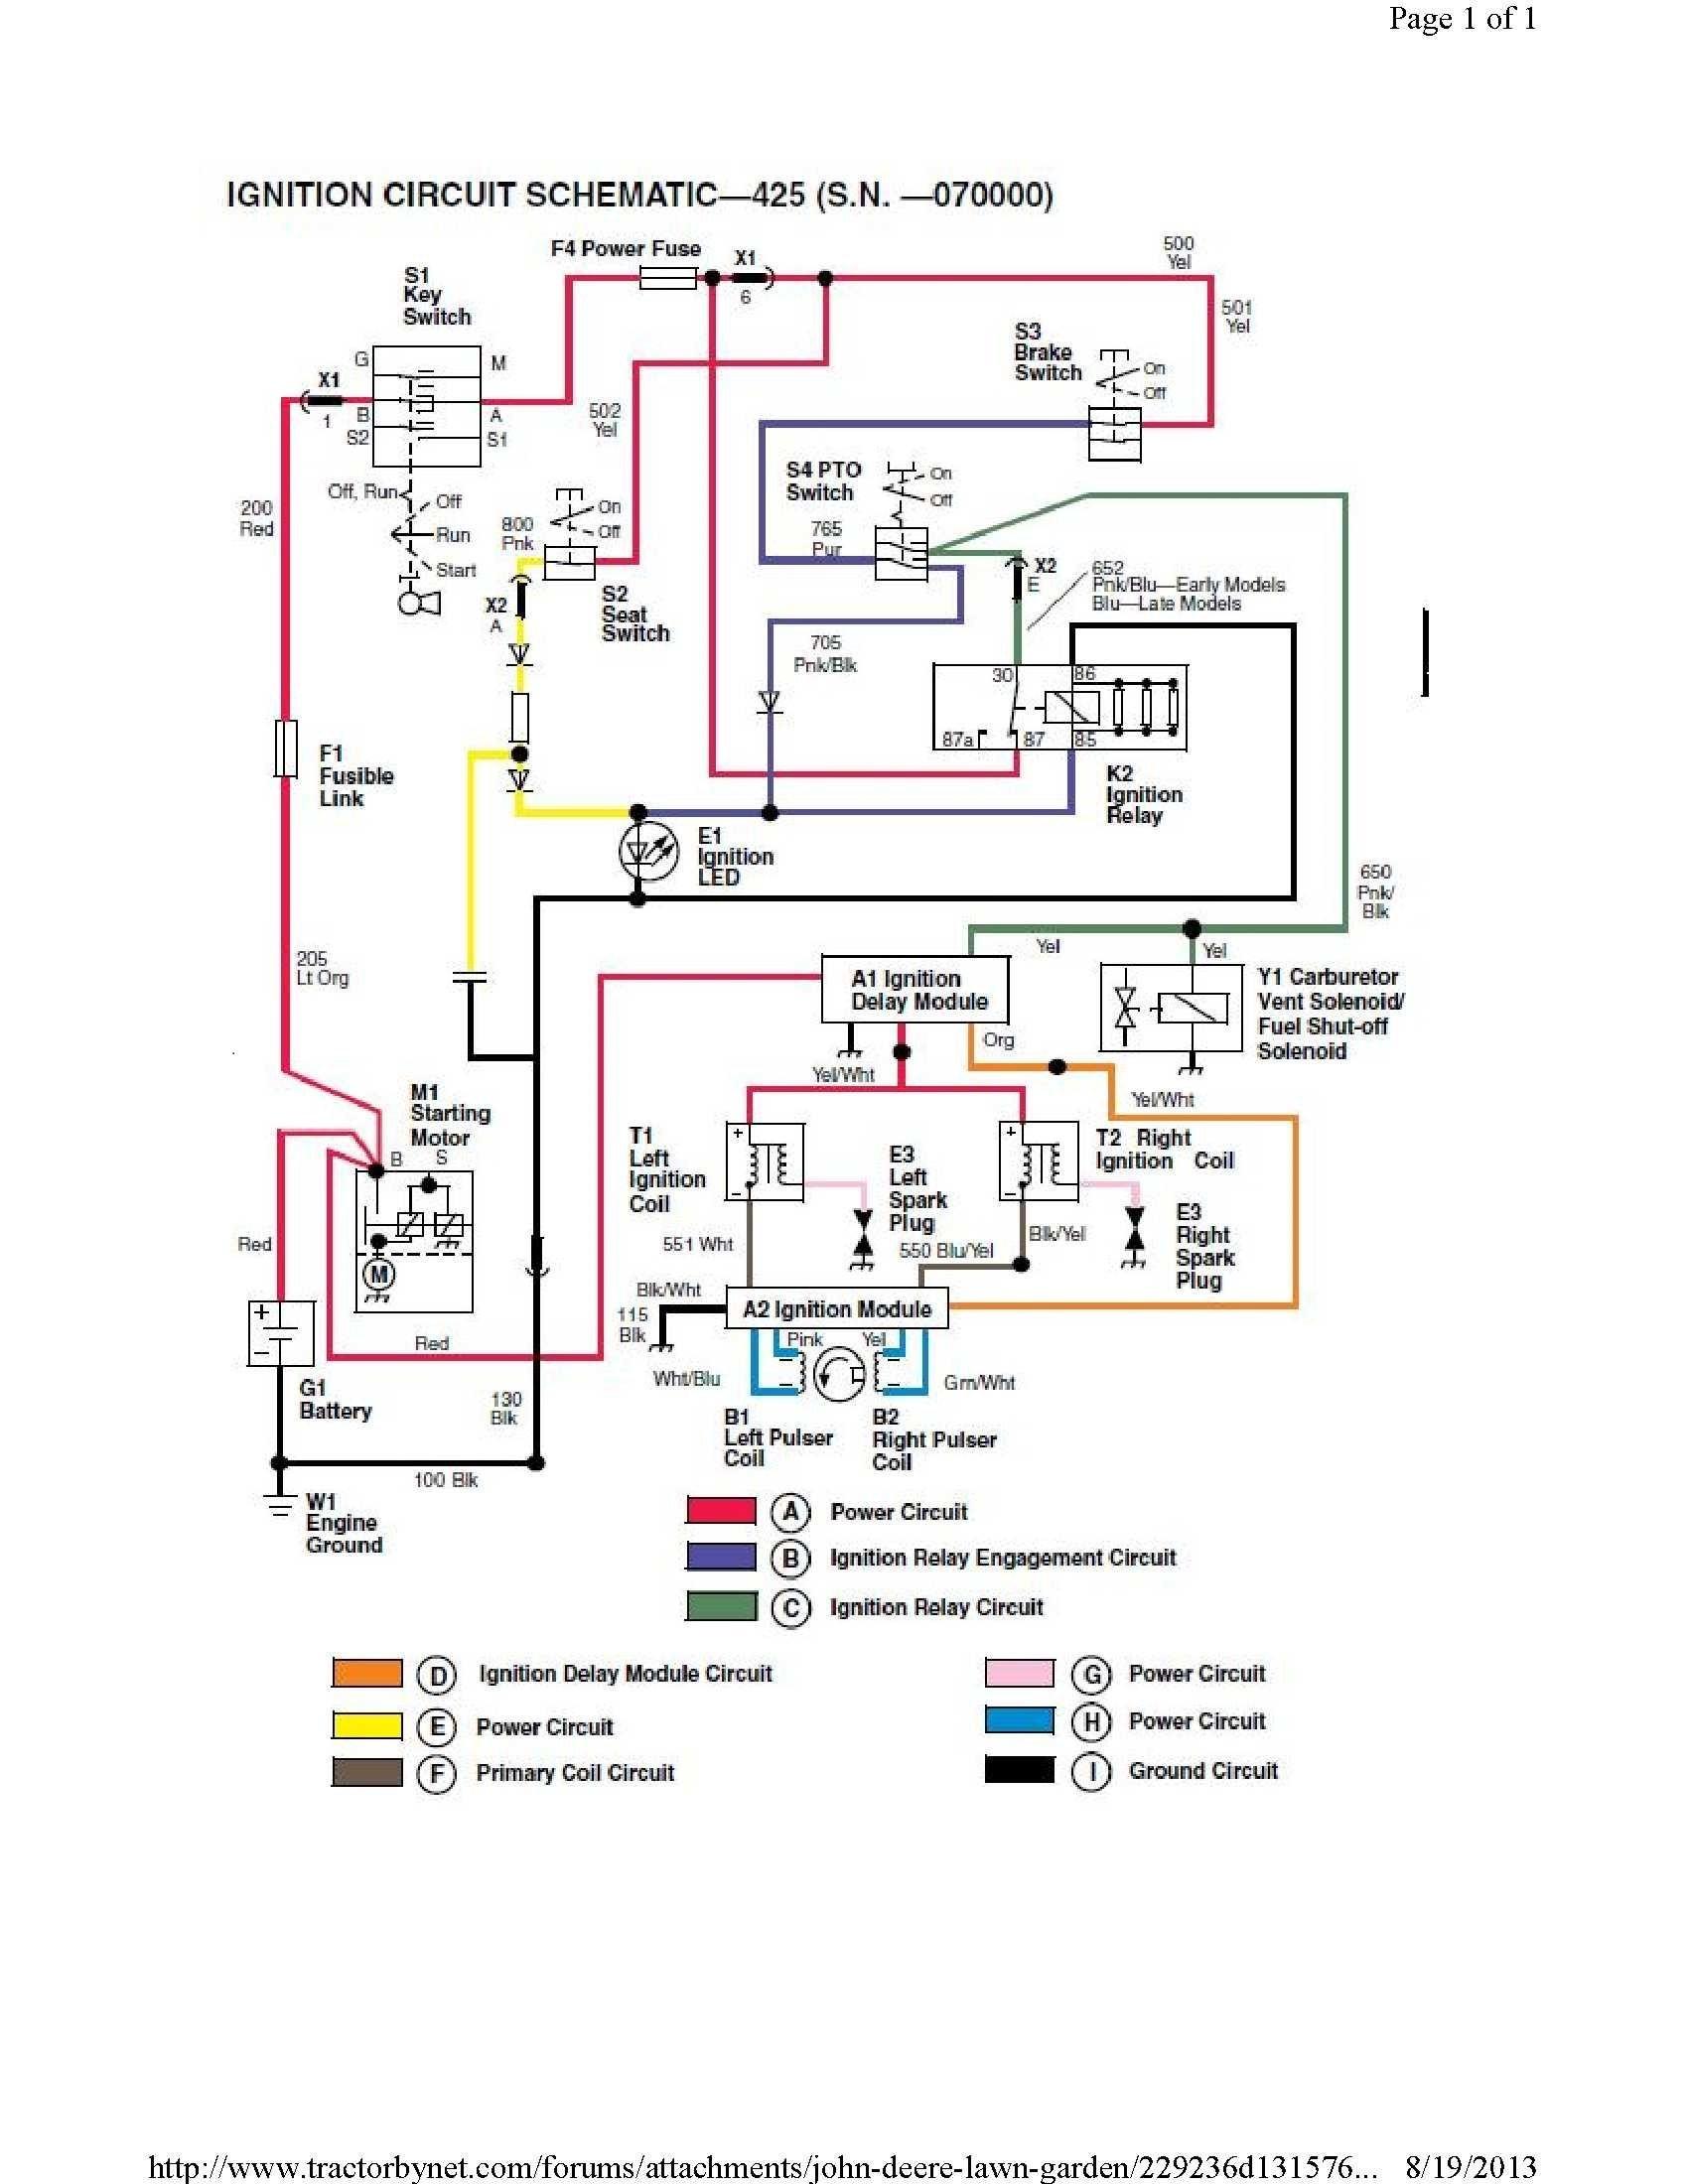 Wiring Diagram for A 345 John Deere Tractor John Deere 345 Electrical Schematic New